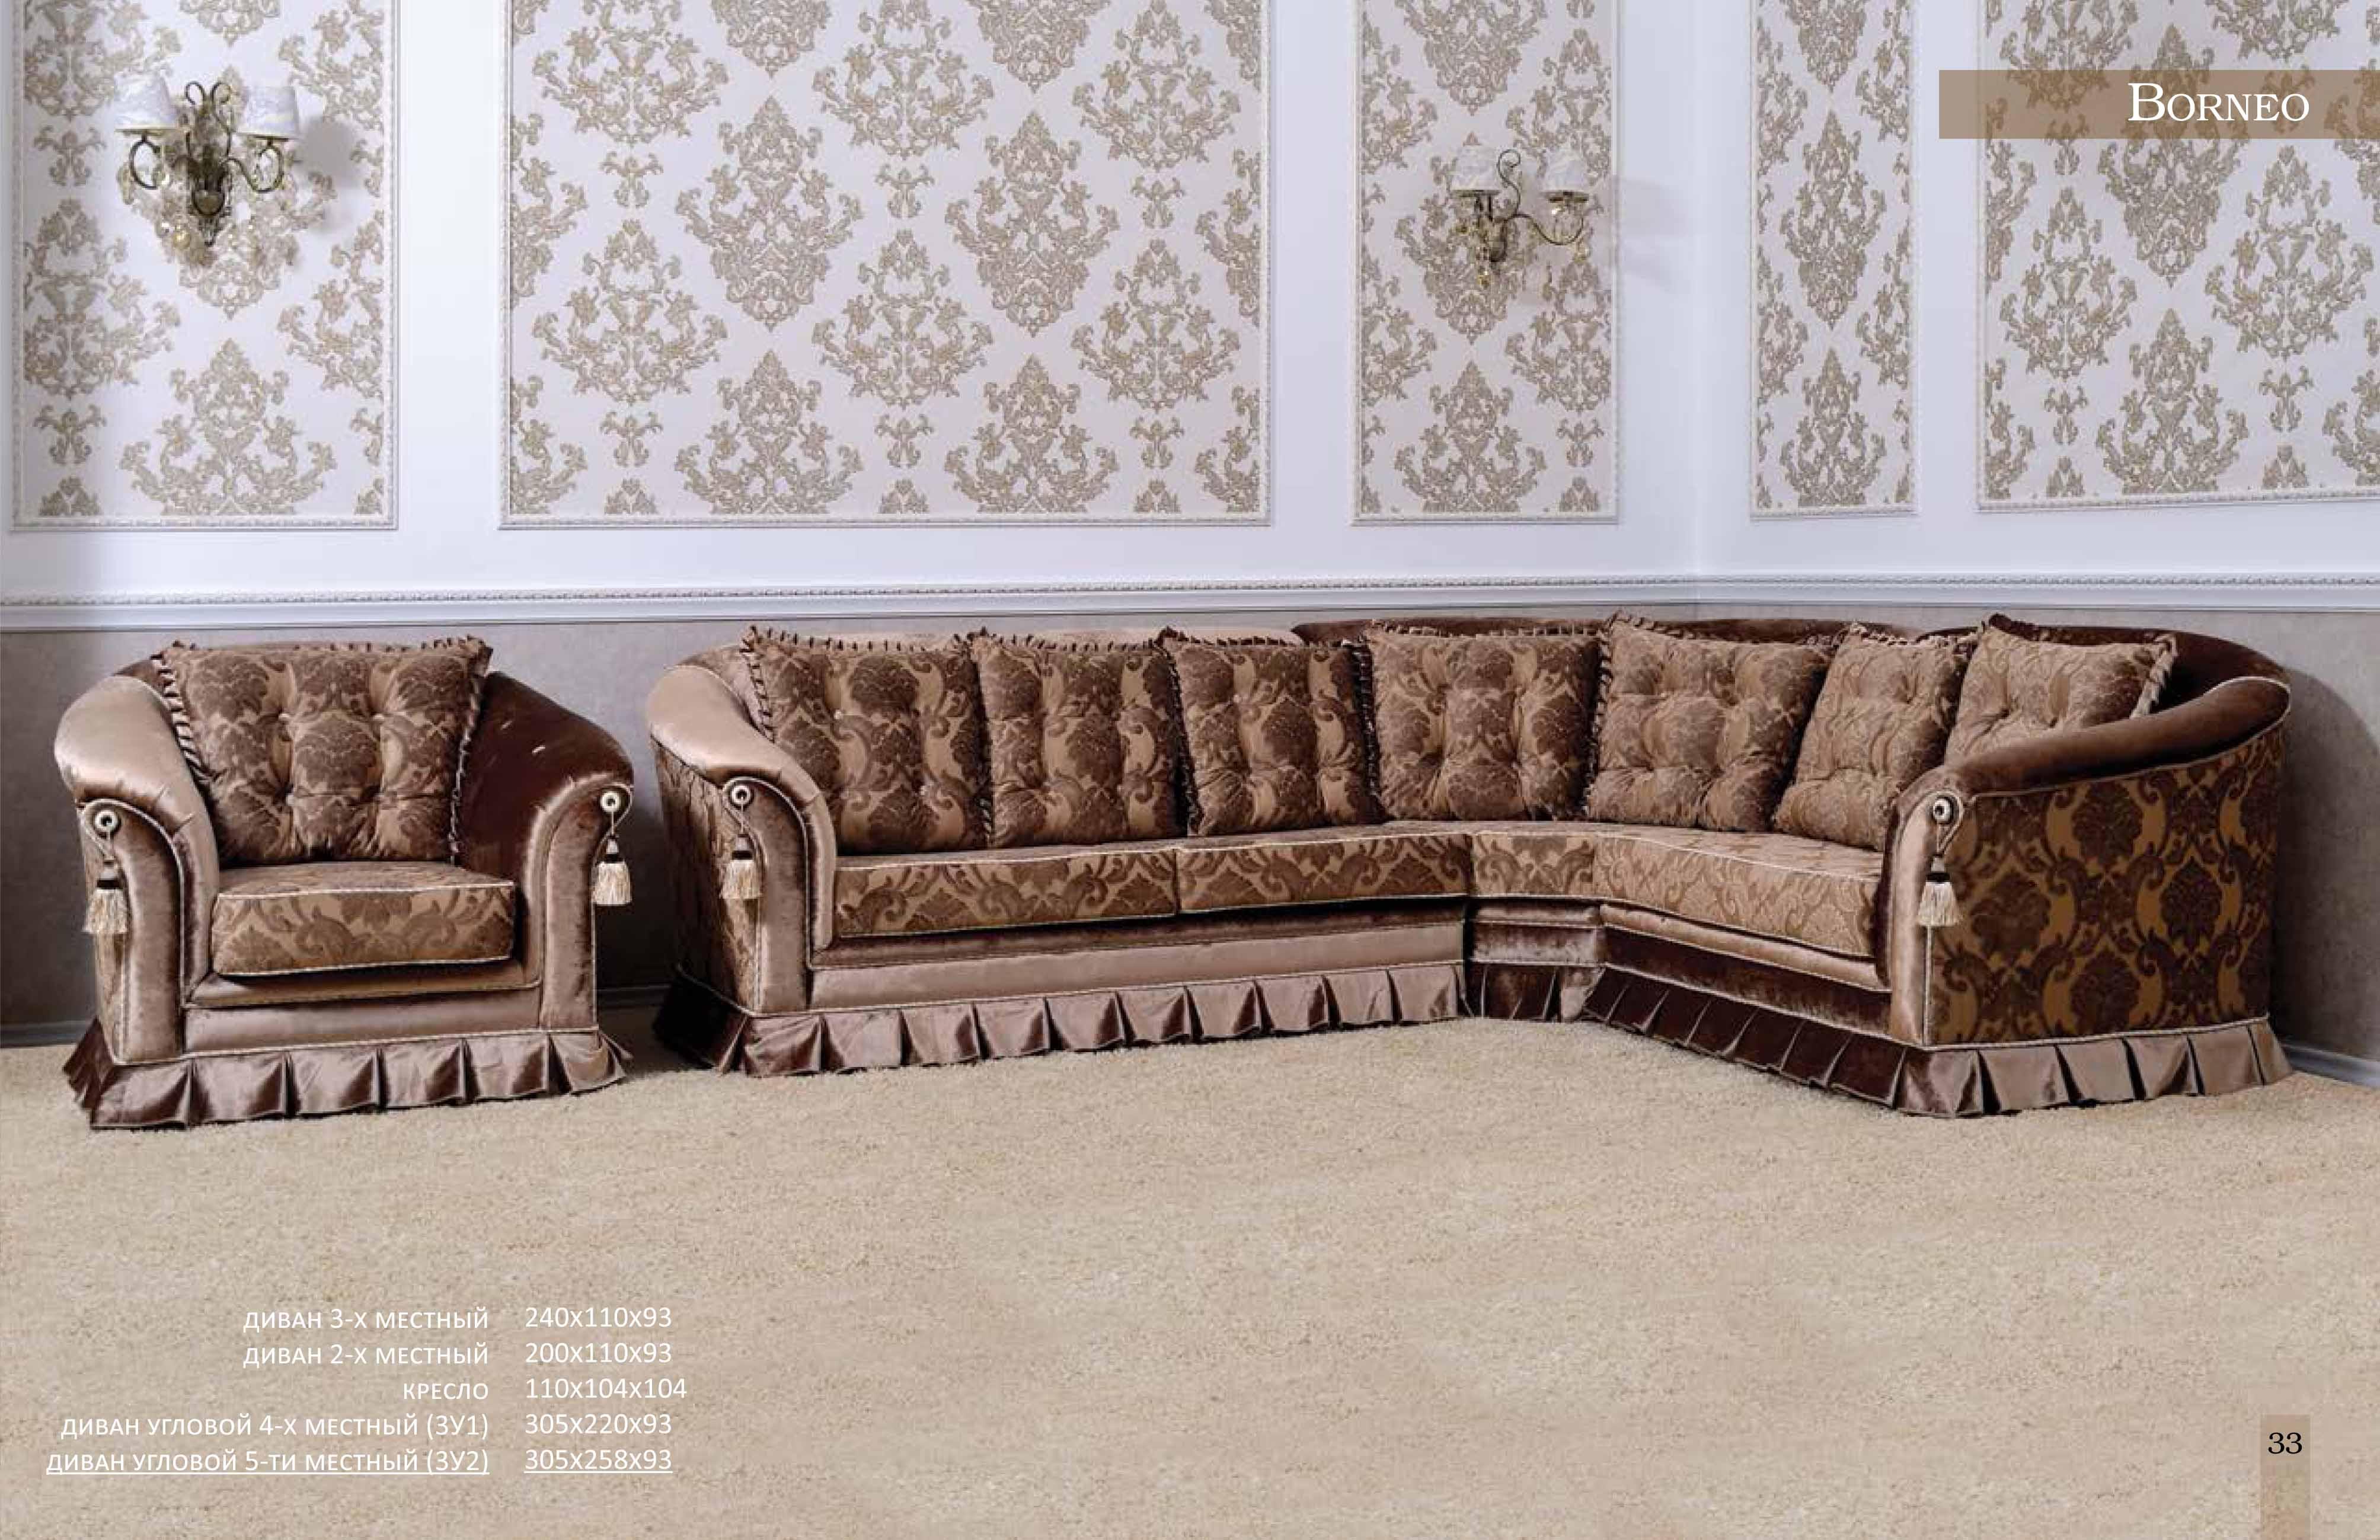 Мягкая мебель Borneo, фабрика Francheska mobili